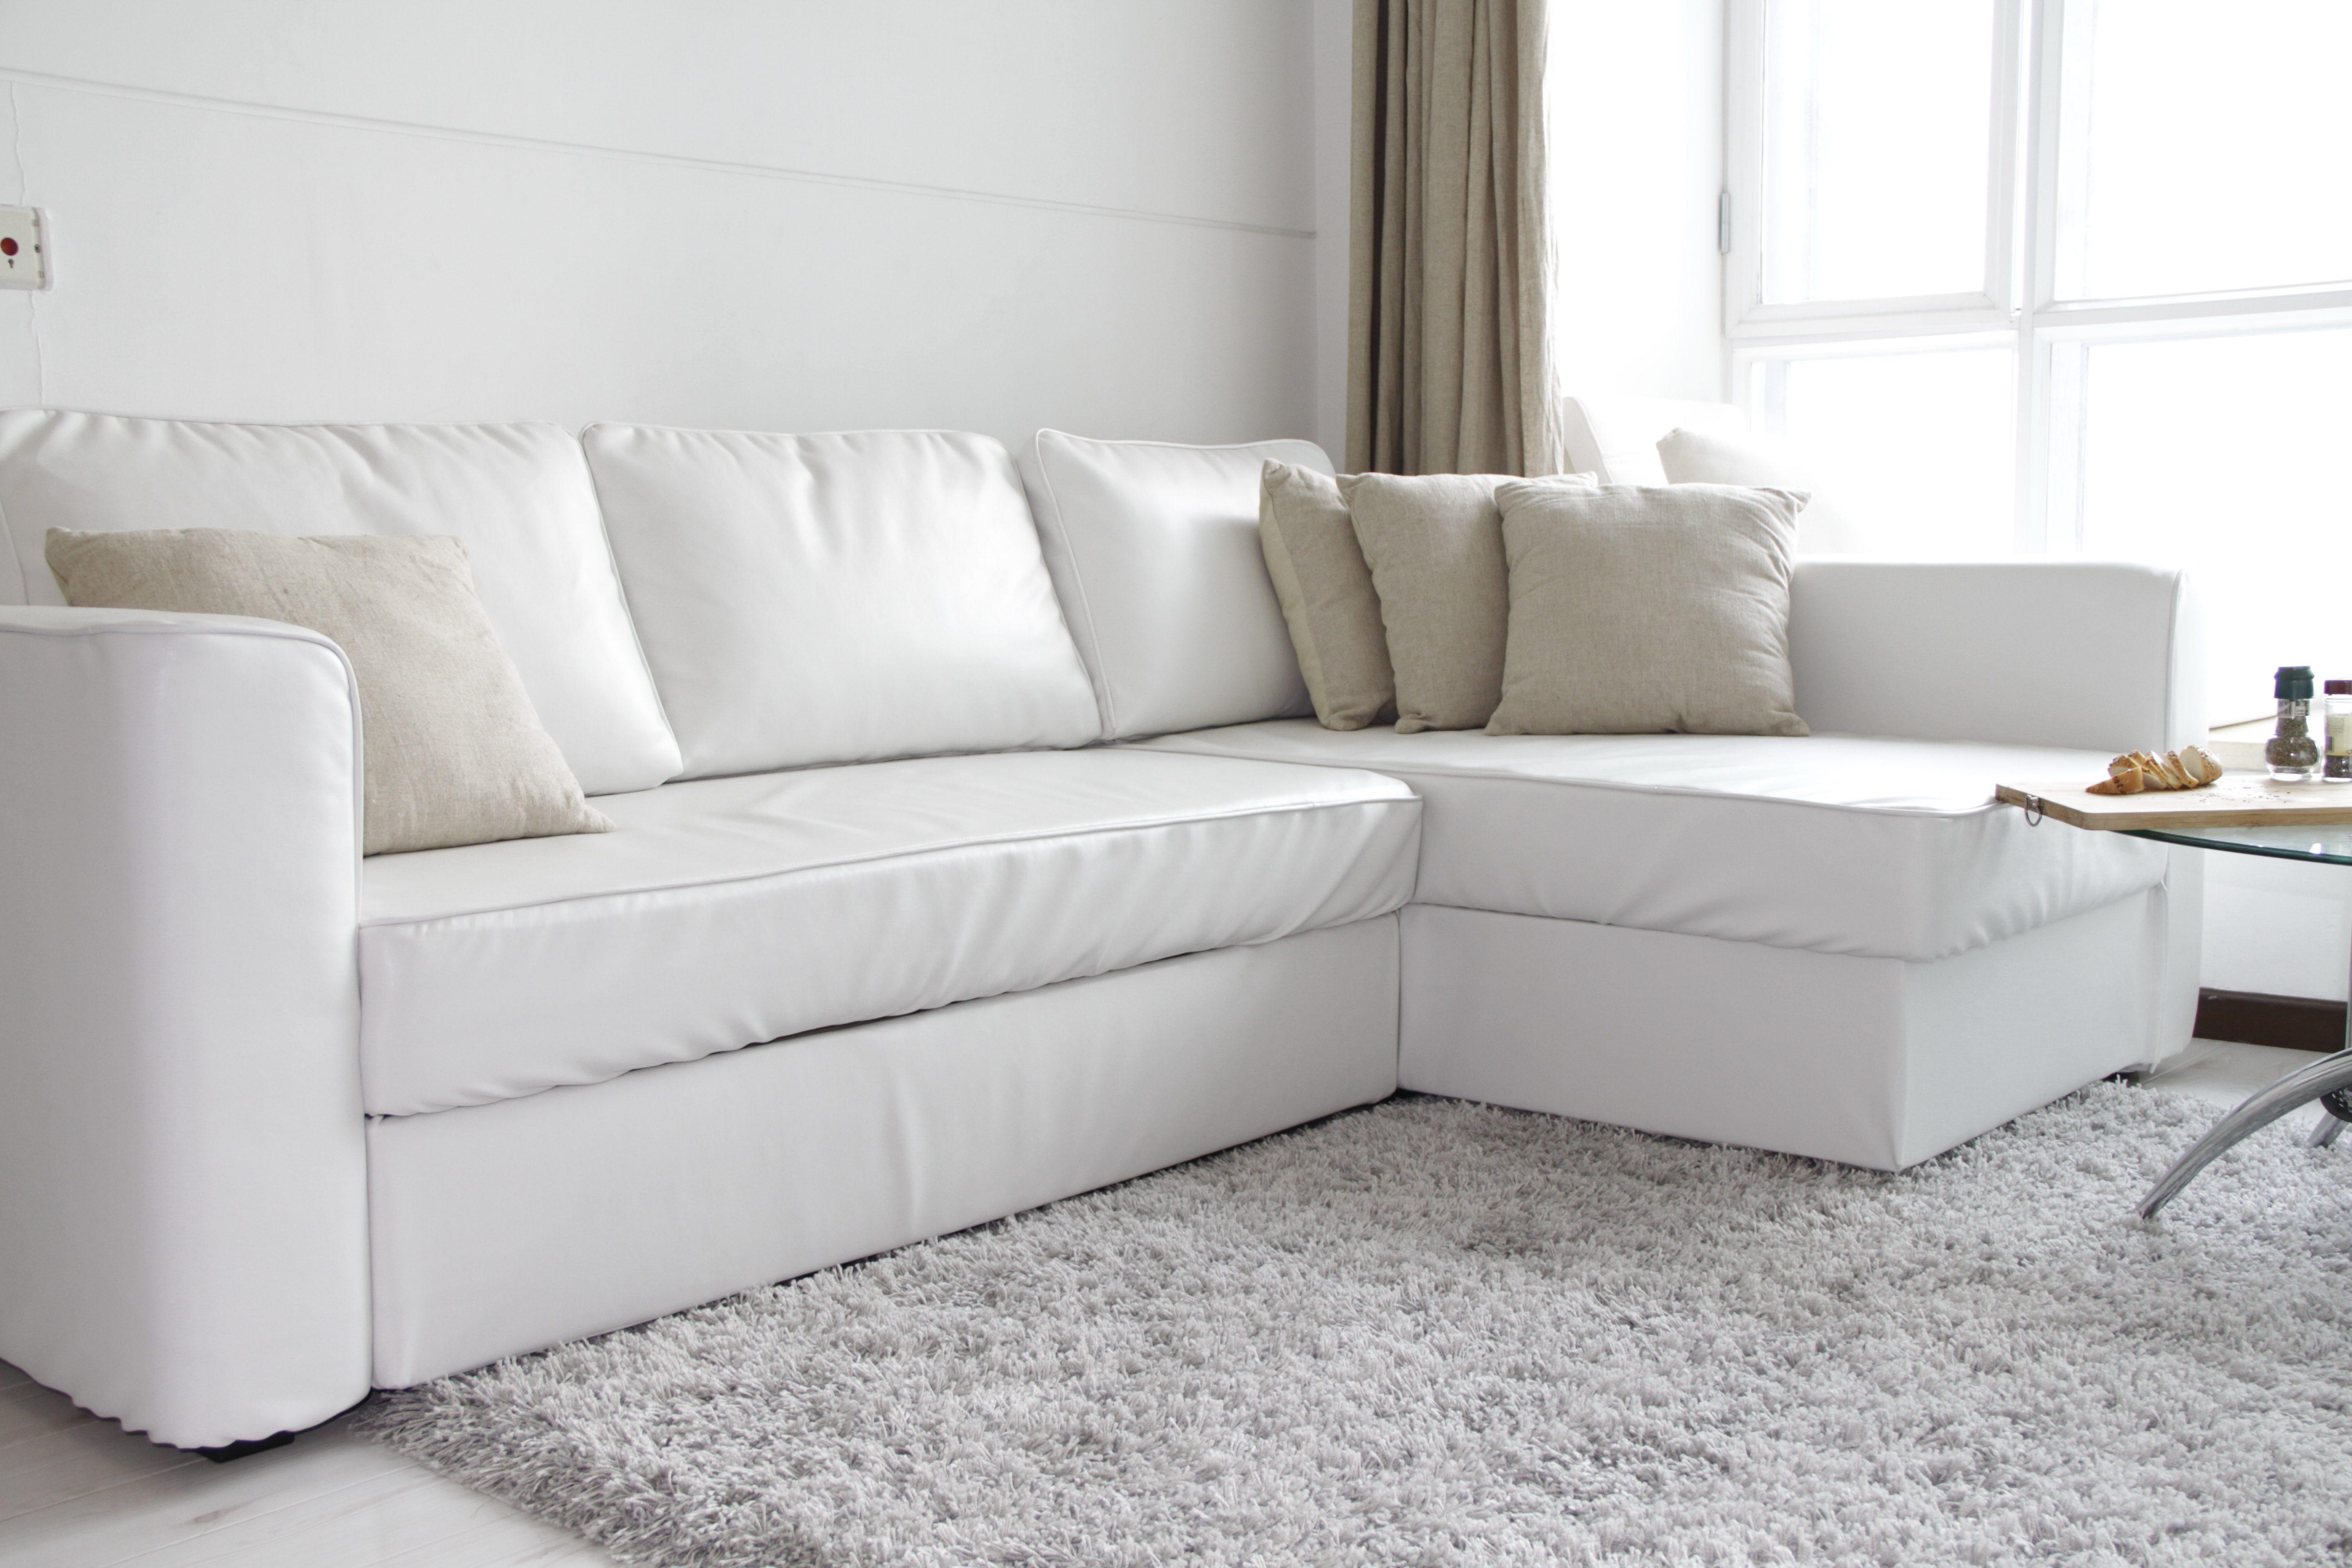 Manstad Snug Fit Modena White